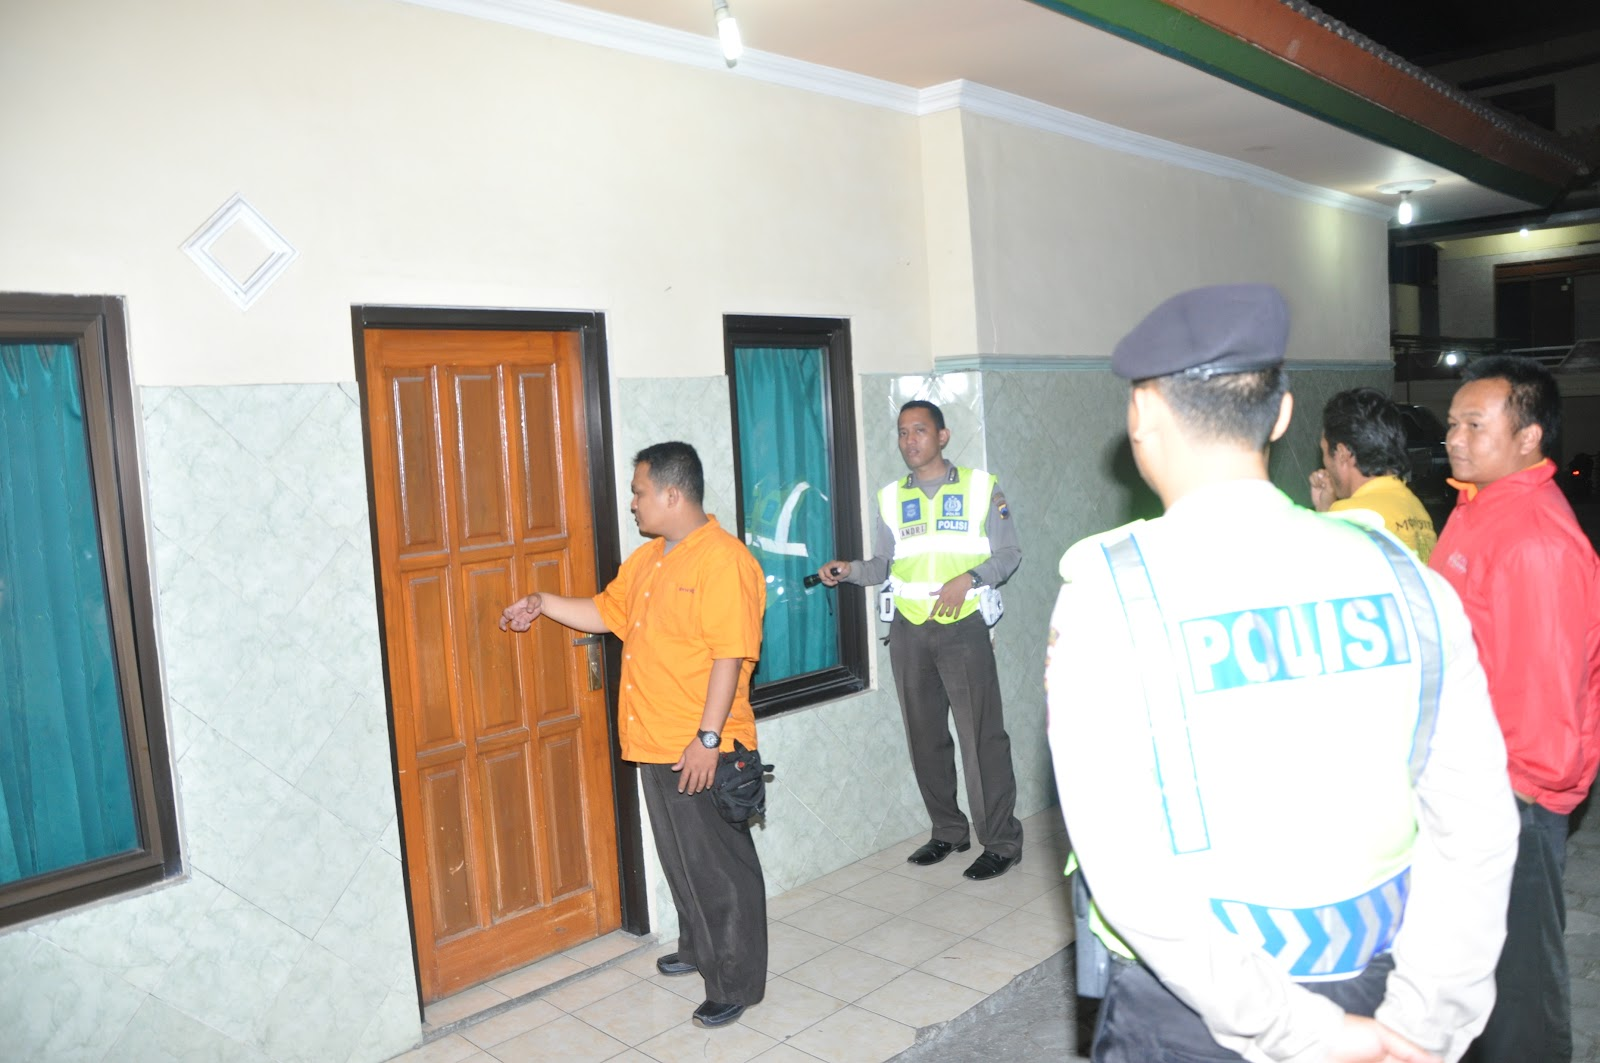 RAZIA HOTEL Petugas Polres Semarang Saat Menggelar Razia Hotel Melati Di Kawasan Bandungan Dalam Operasi Pekat Candi 2012 Minggu 22 7 Dini Hari